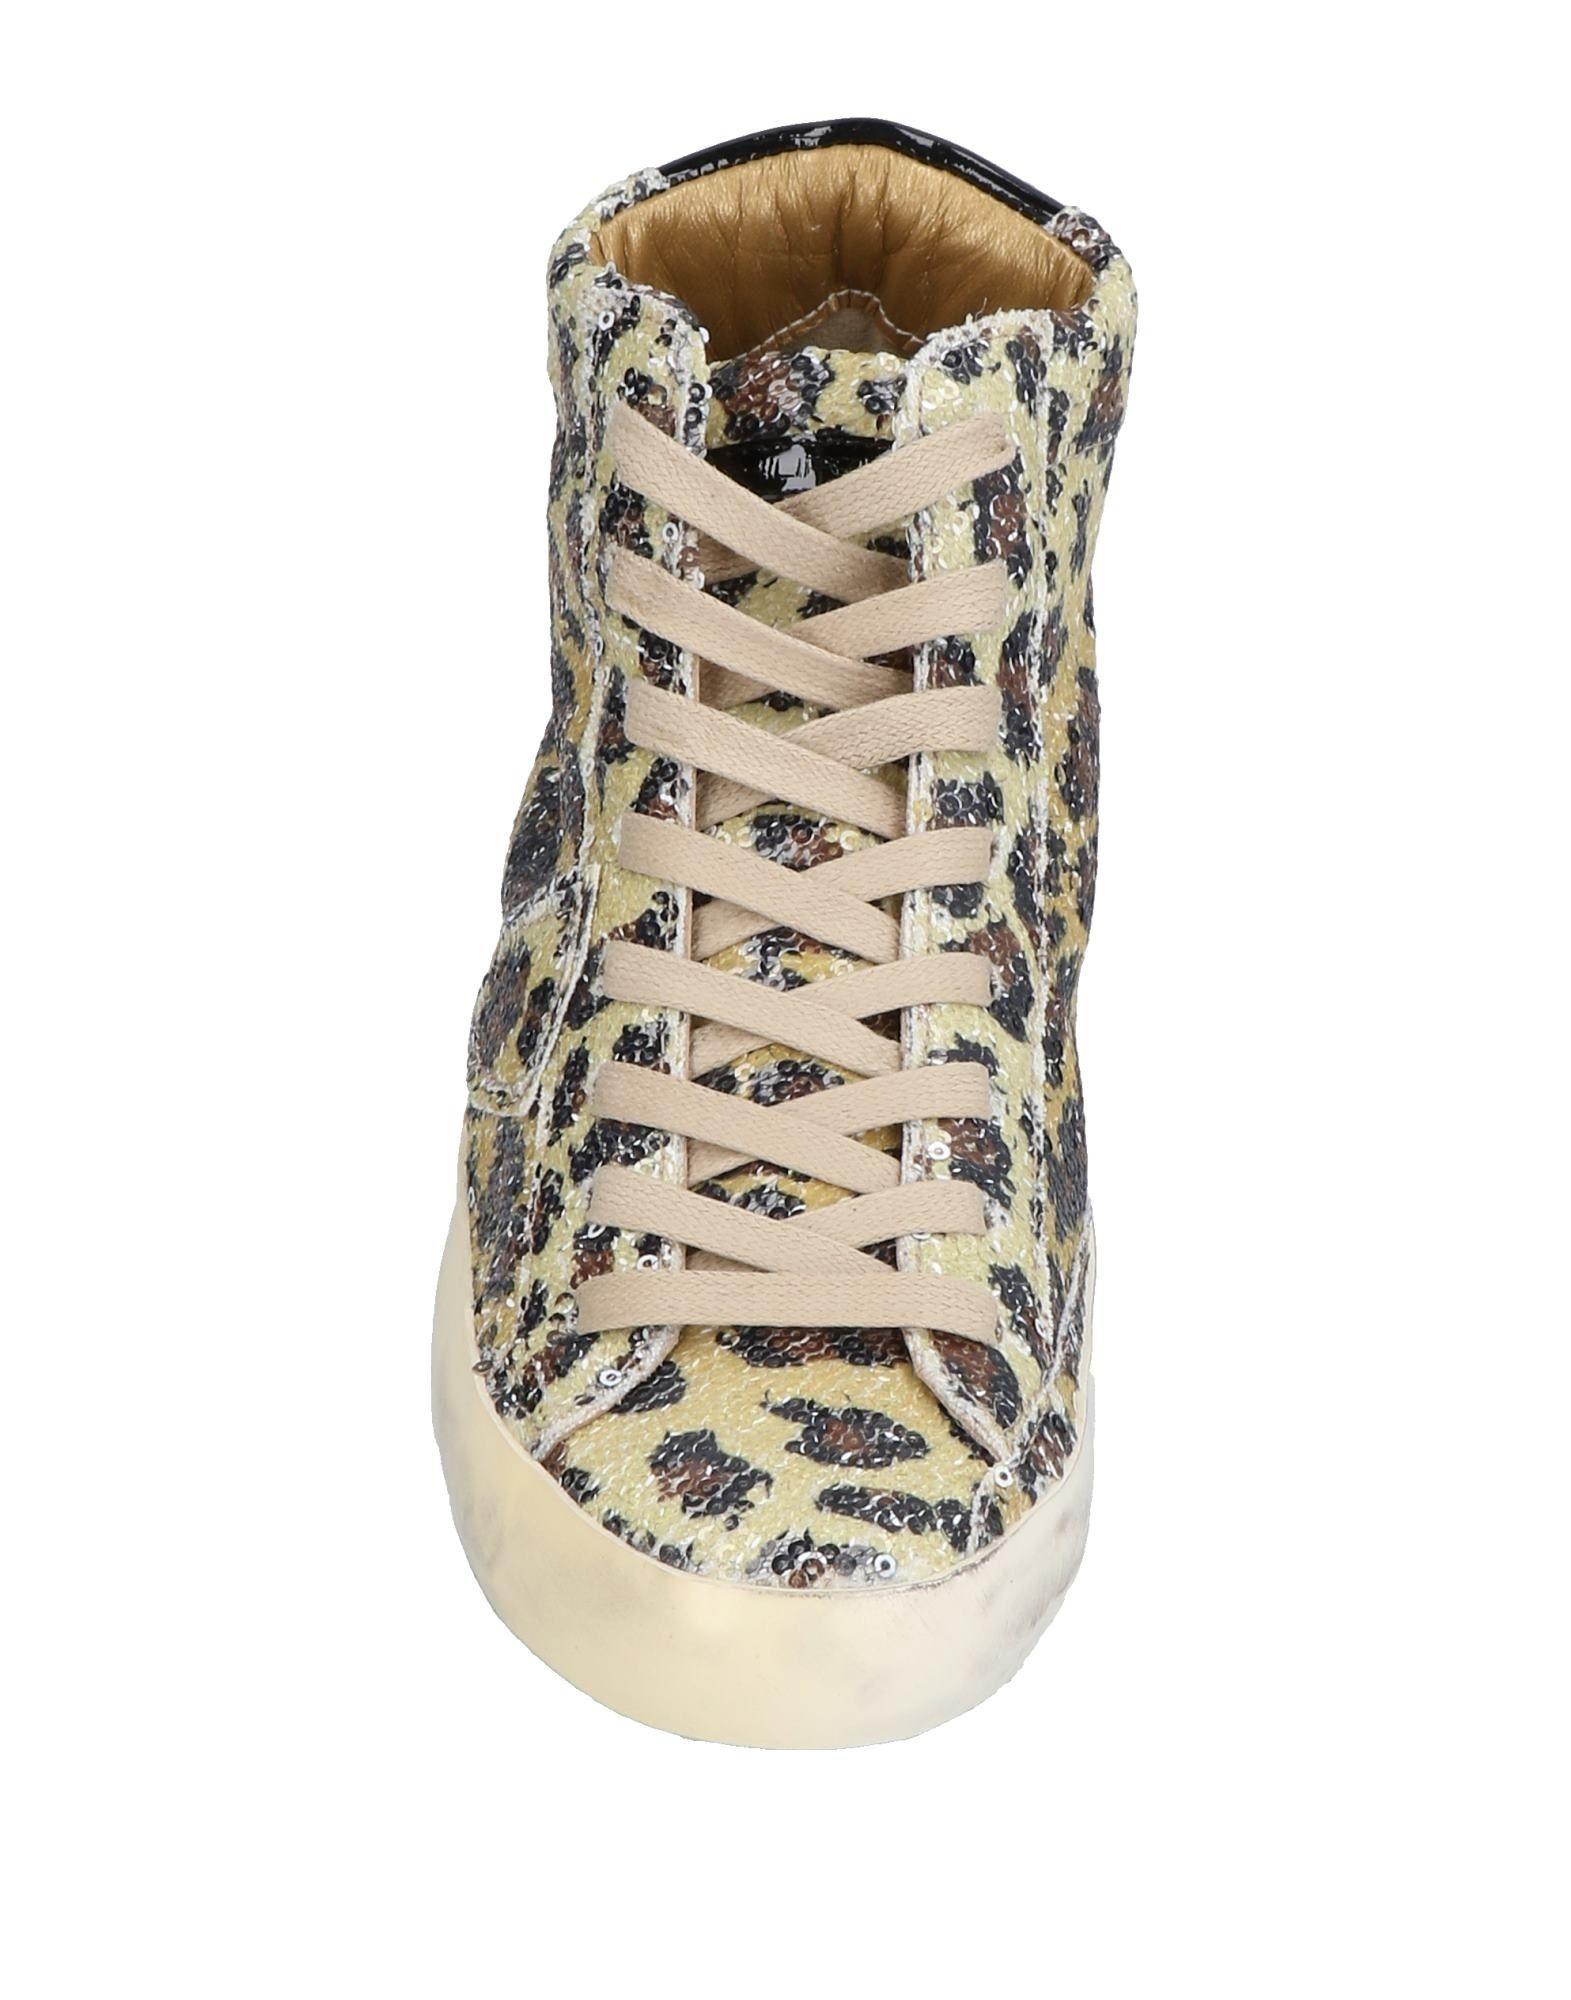 Stilvolle billige Schuhe Damen Philippe Model Sneakers Damen Schuhe  11478642AB 1d0b0d